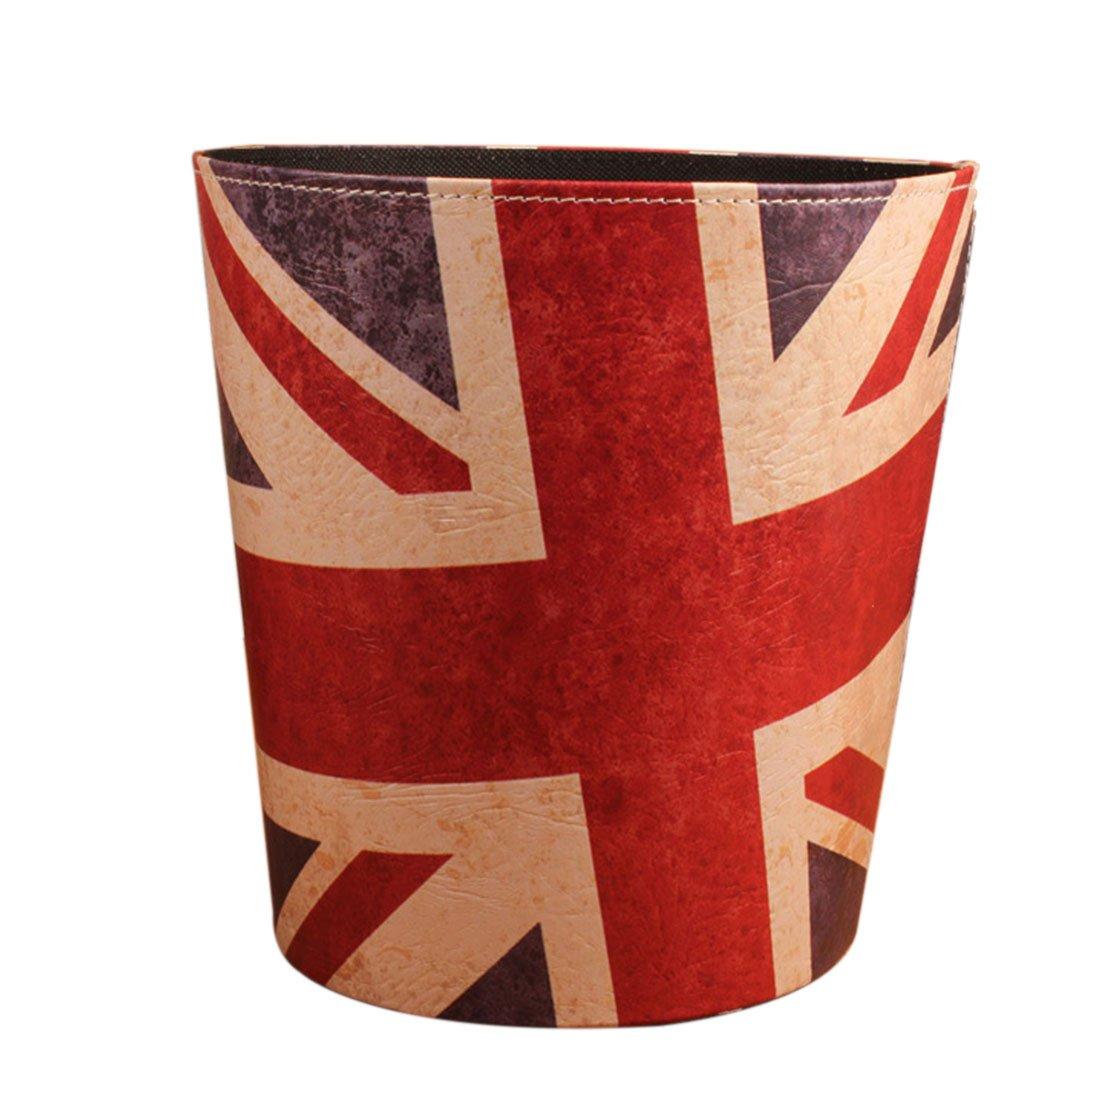 Wastebasket Trash Can for Bedroom Bathroom Kitchen Office Recycling Garbage Bin - Union Jack Flag Pattern